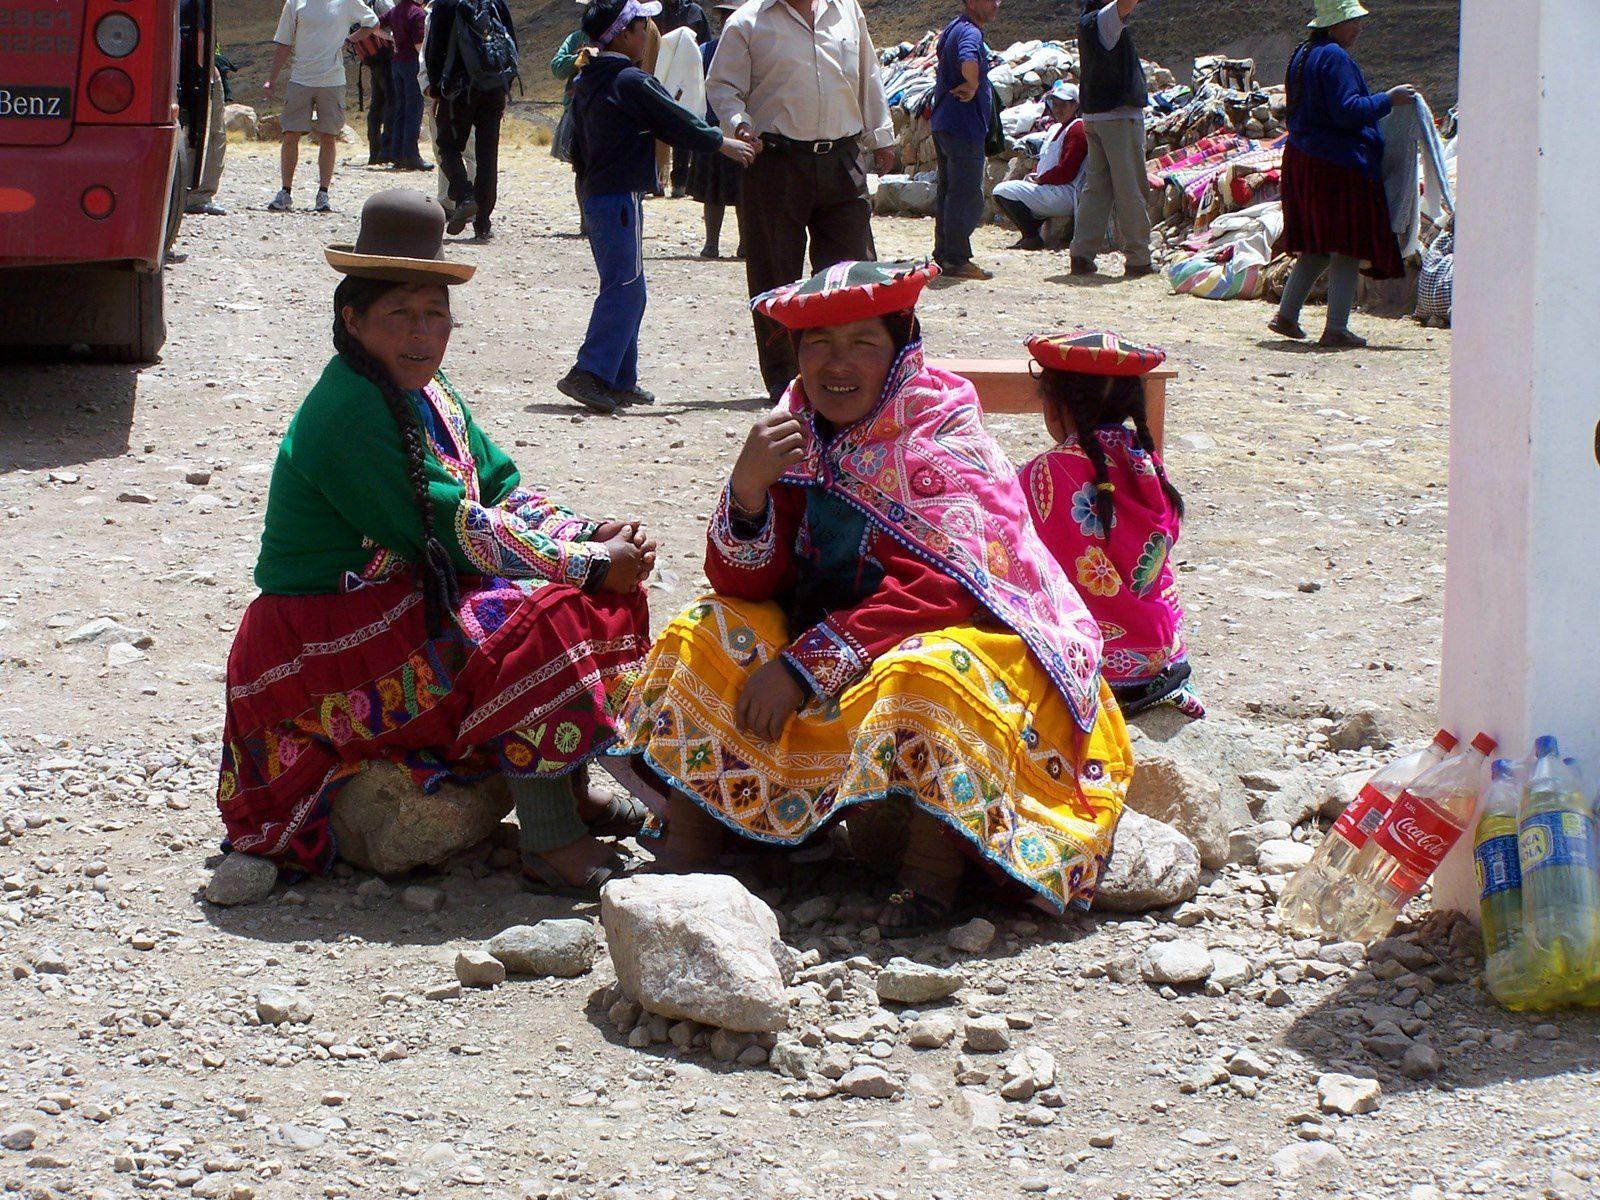 Femmes assises dans la rue (Catherine)